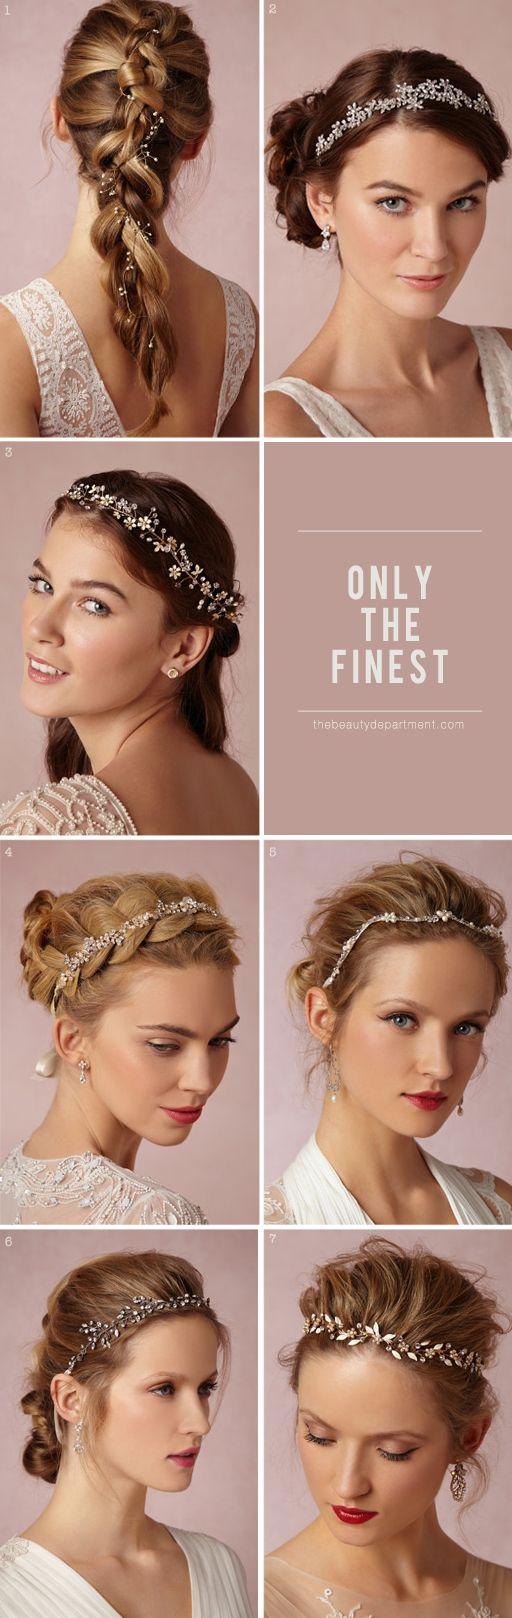 bride hair accessories -- Sakura Halo, Portici Halo, Buttercup Halo, Pearl Petal Halo, Waterway Halo, Starry Skies Halo, Bluebell Halo,